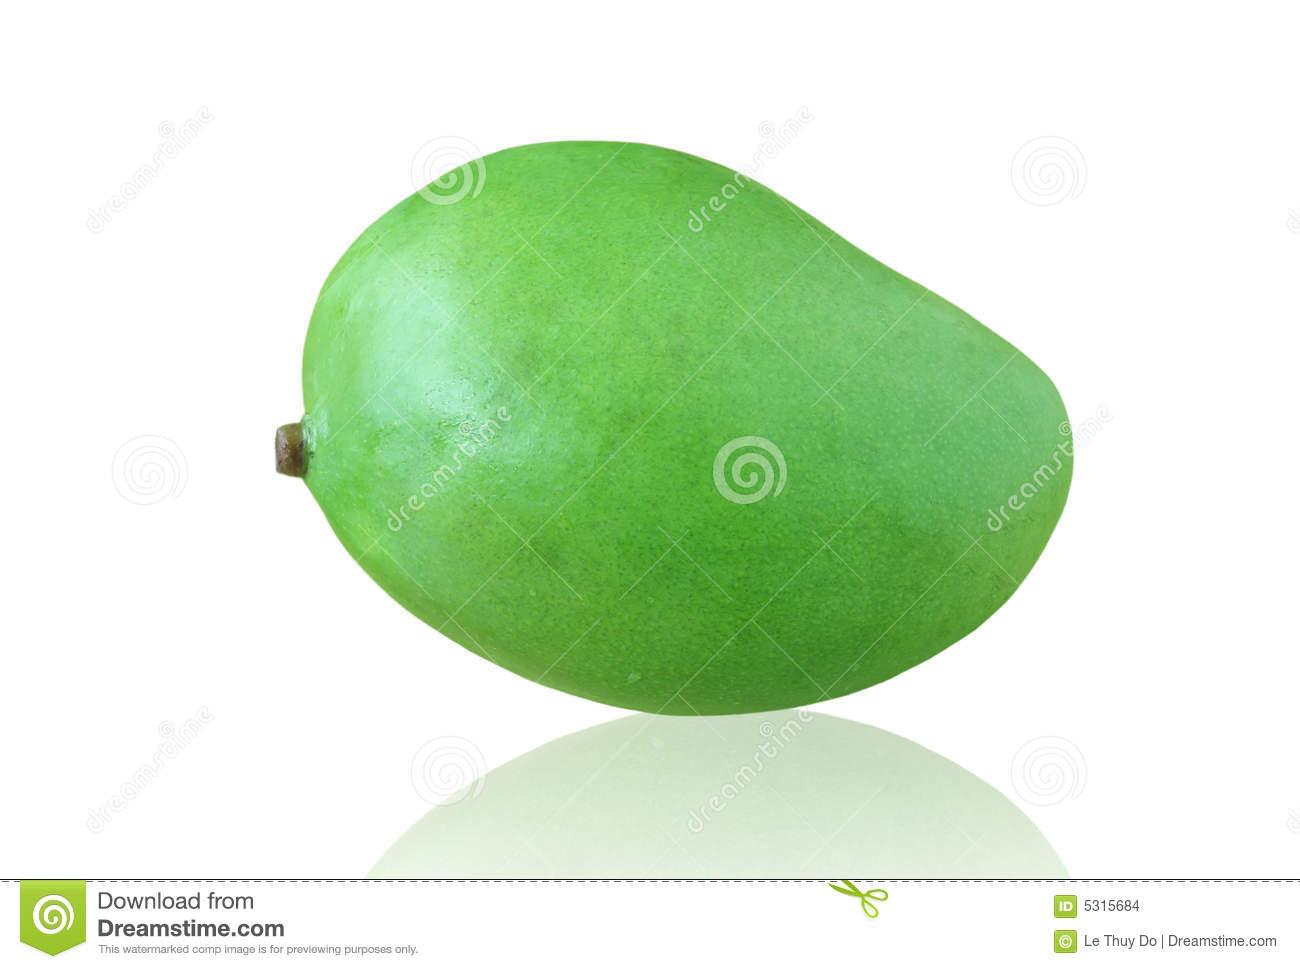 Mango clipart unripe mango. Green station